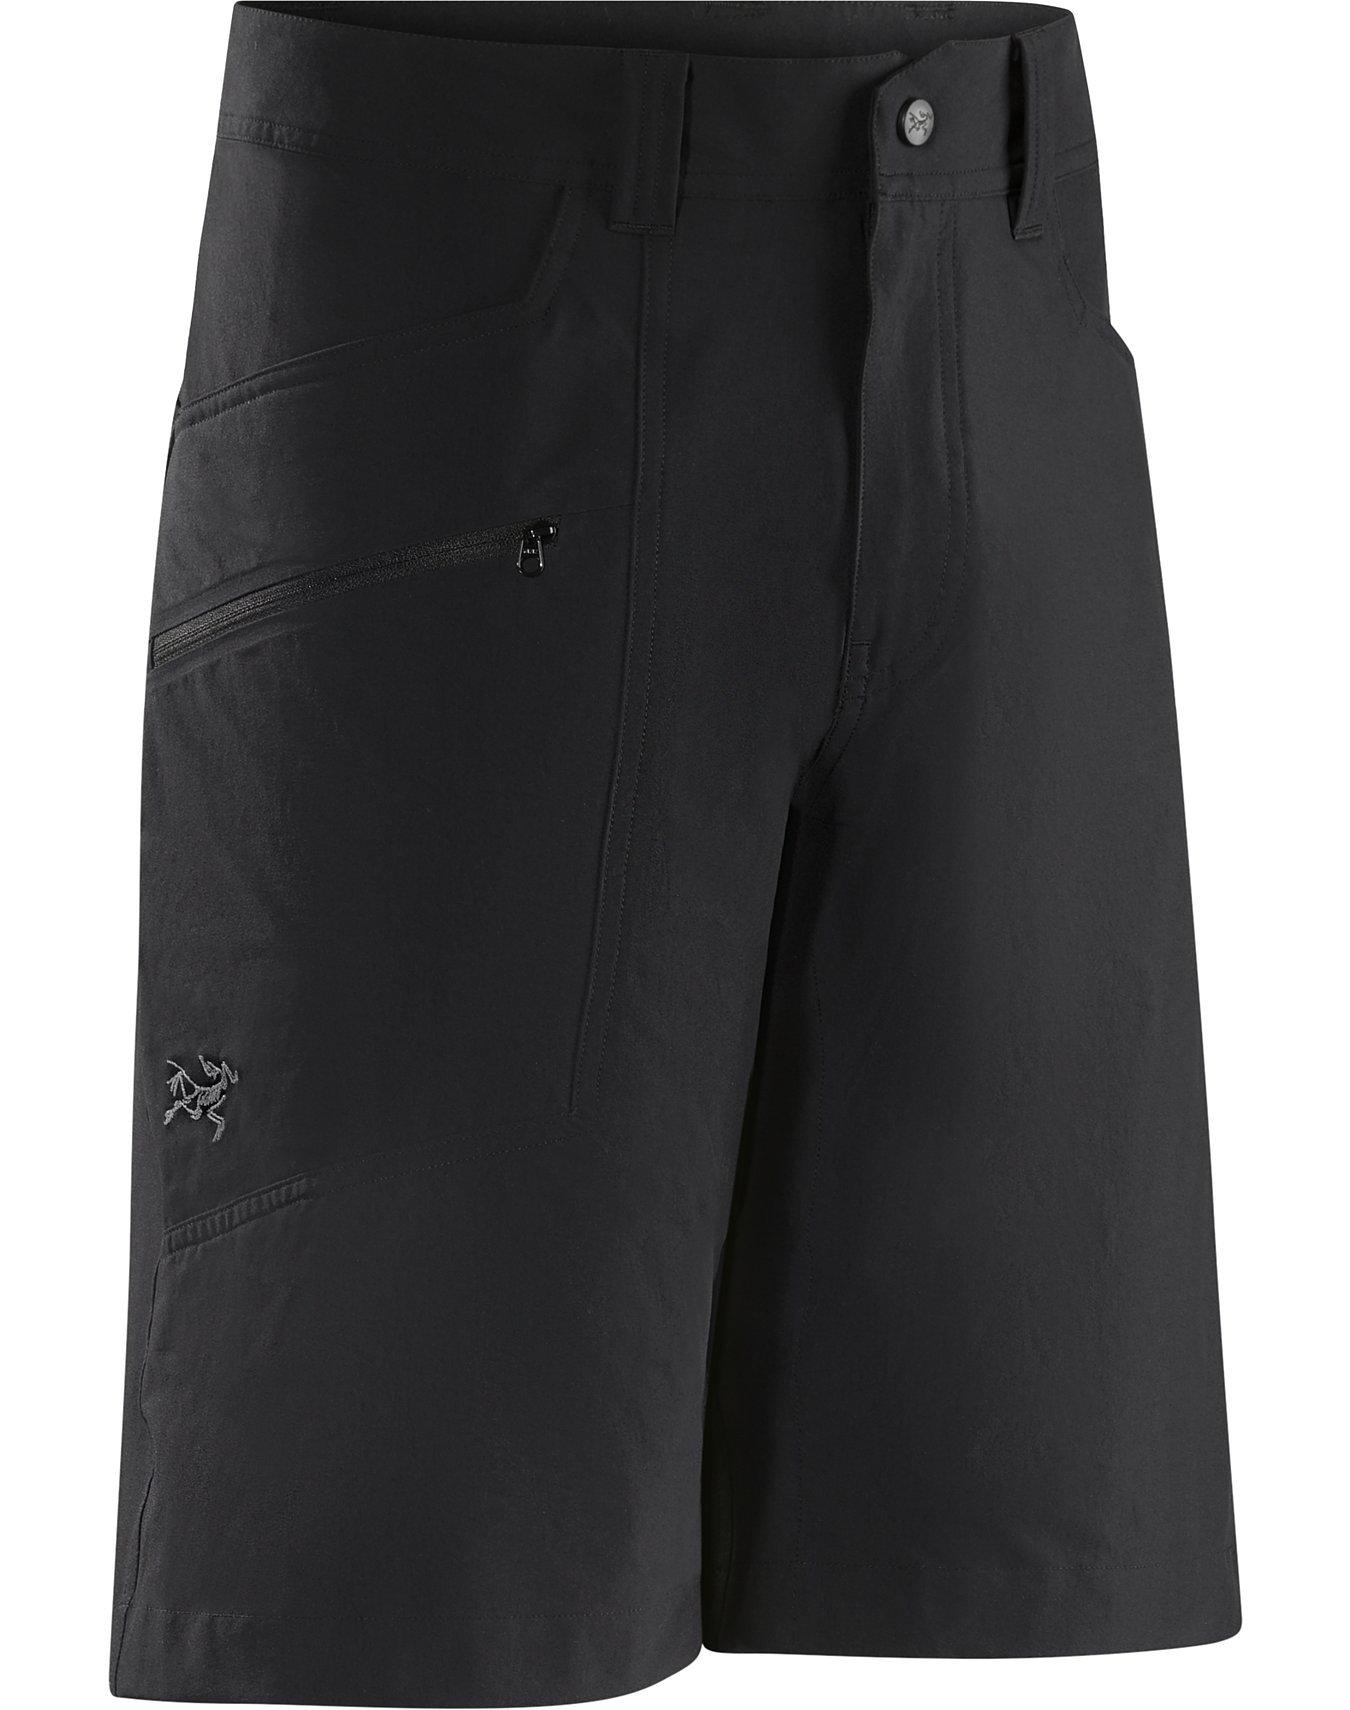 Arc'teryx Perimeter Short Men's (Black, 28)